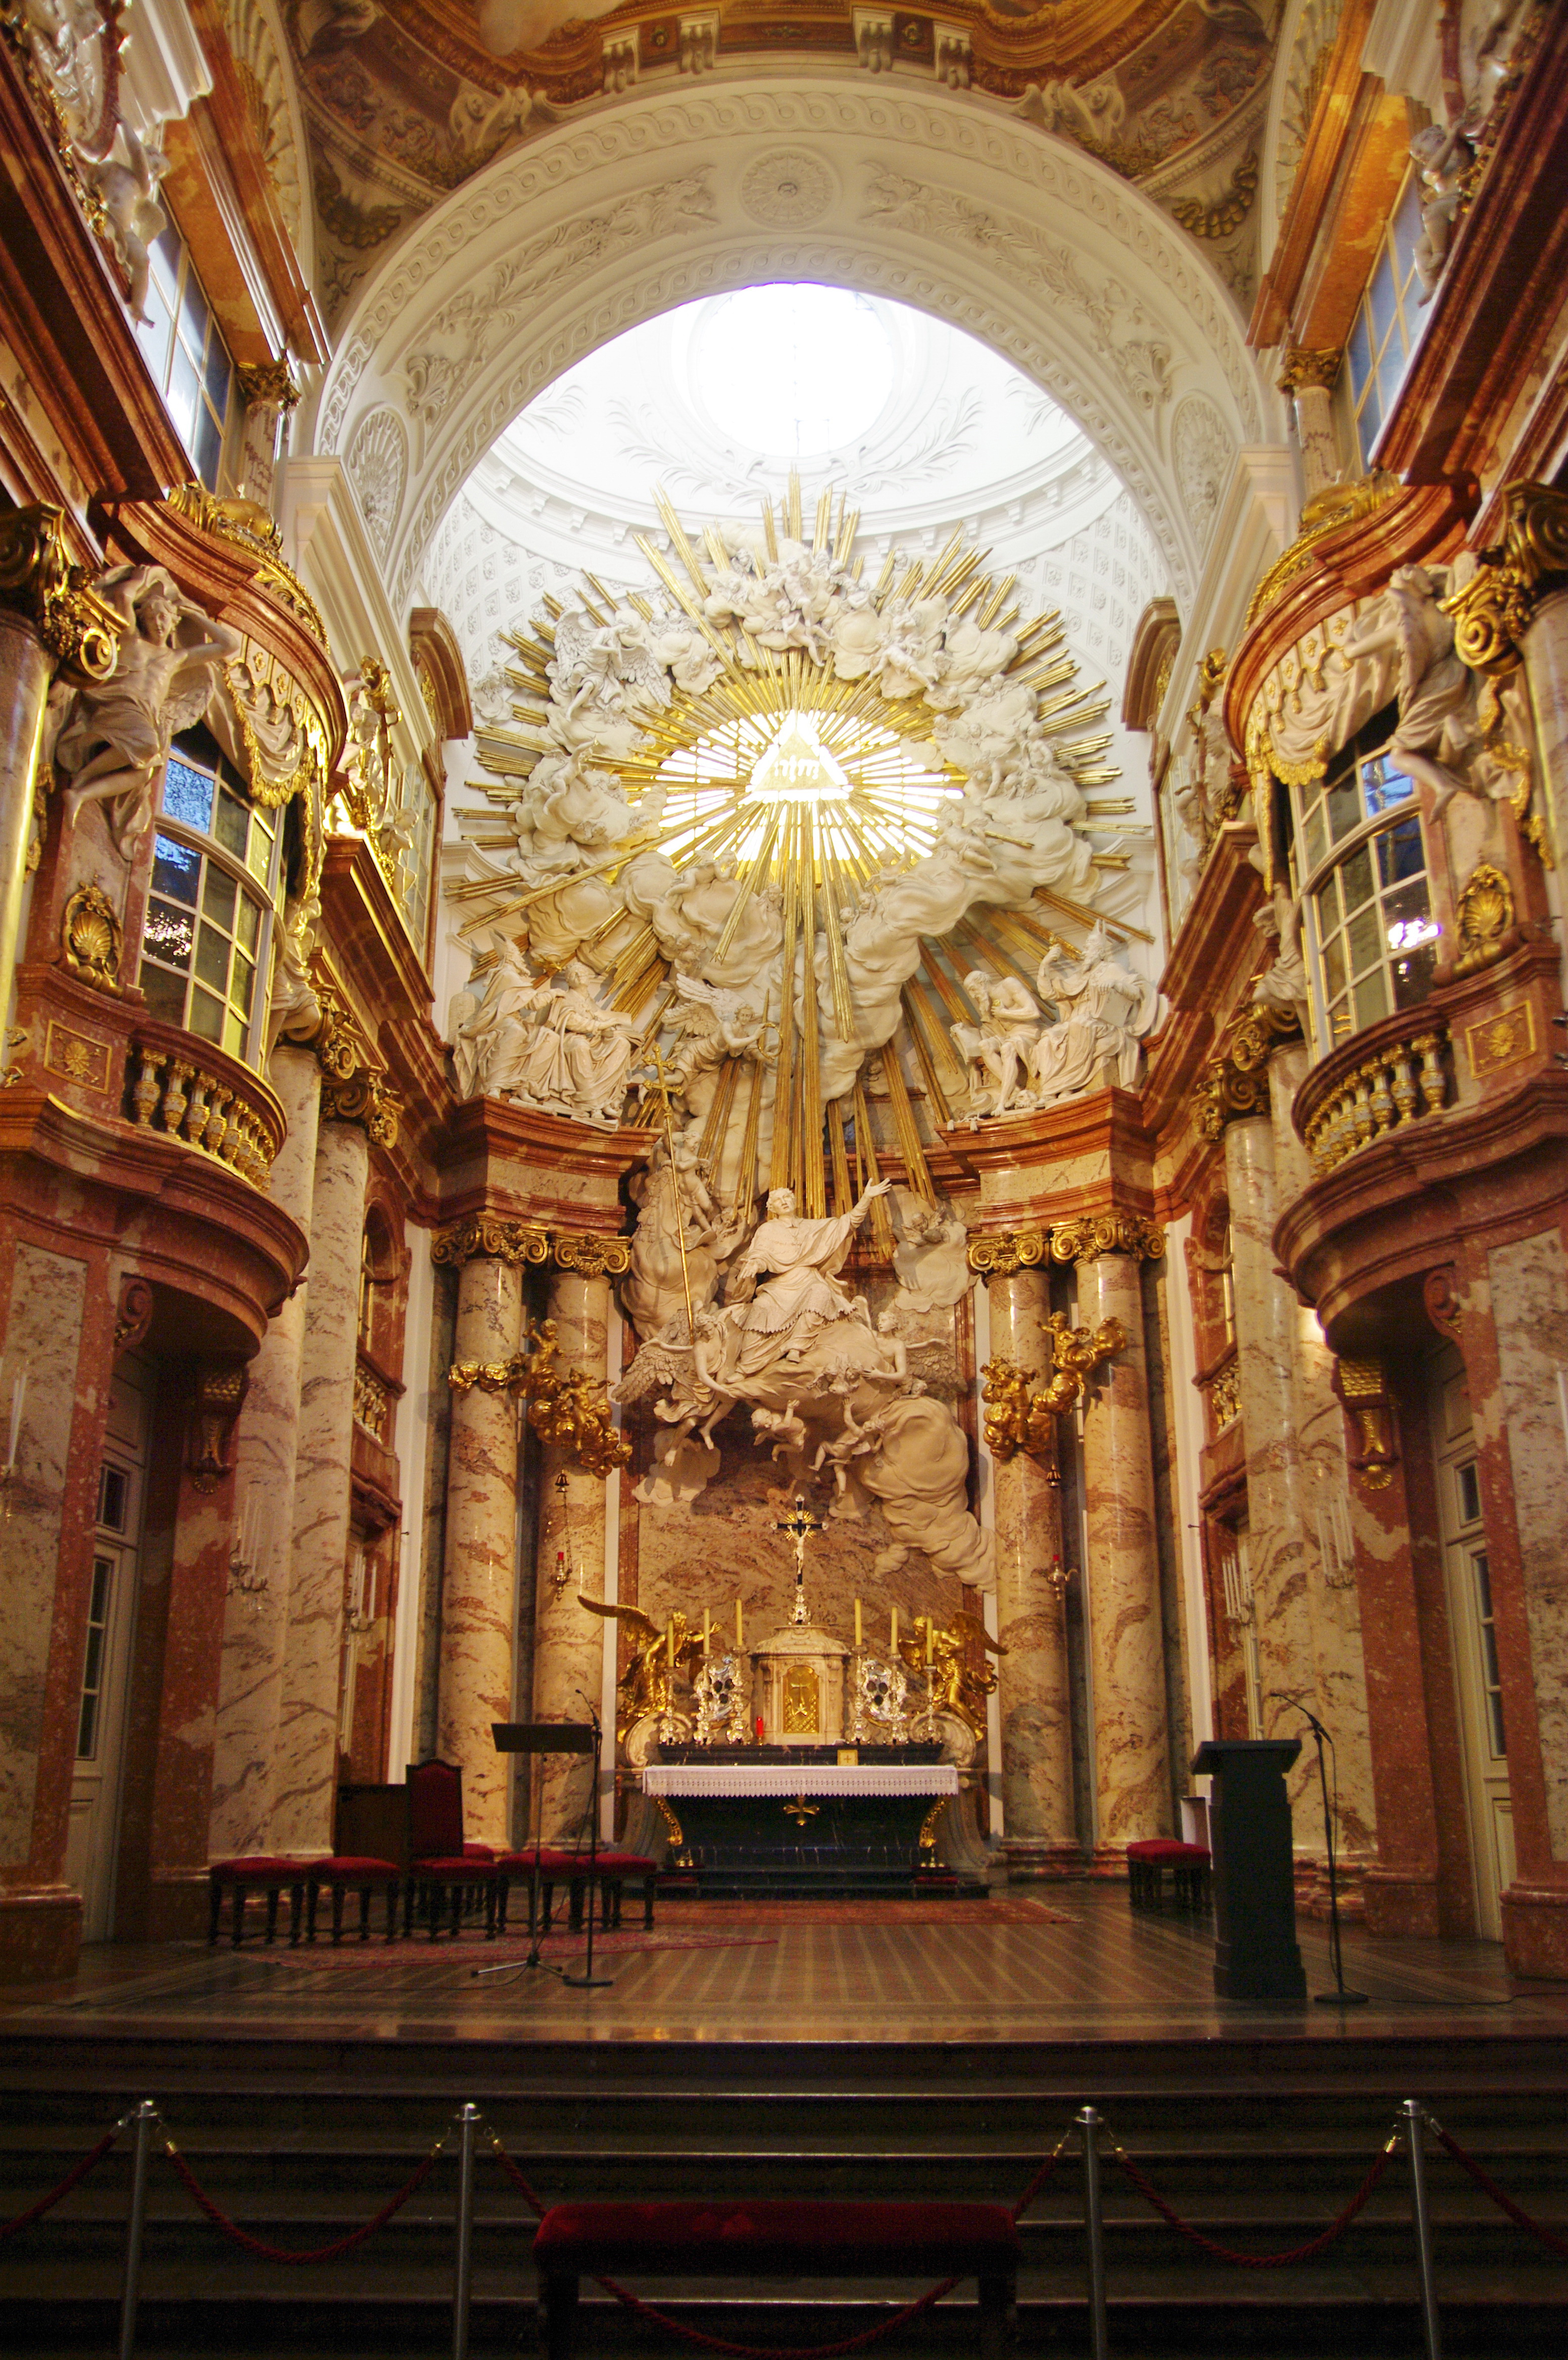 http://upload.wikimedia.org/wikipedia/commons/4/4a/A-Wien-Karlskirche-Chorraum.JPG